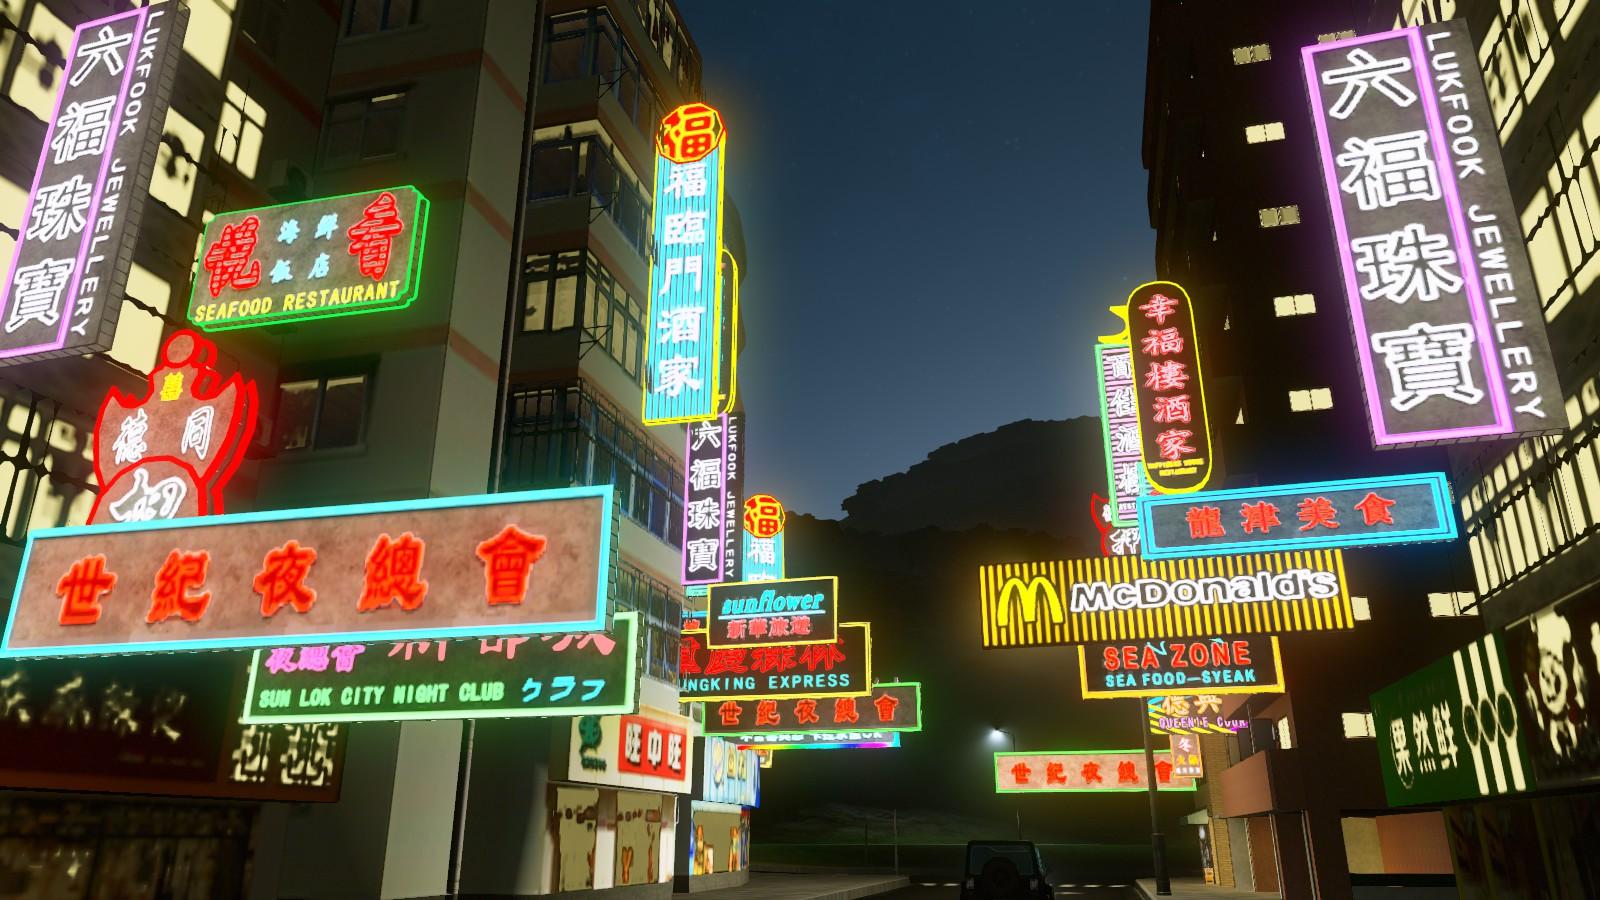 Steam Workshop    Hk Neon Lighting  U6e2f U5f0f U9713 U8679 U71c8 U5ee3 U544a U724c Hong Kong